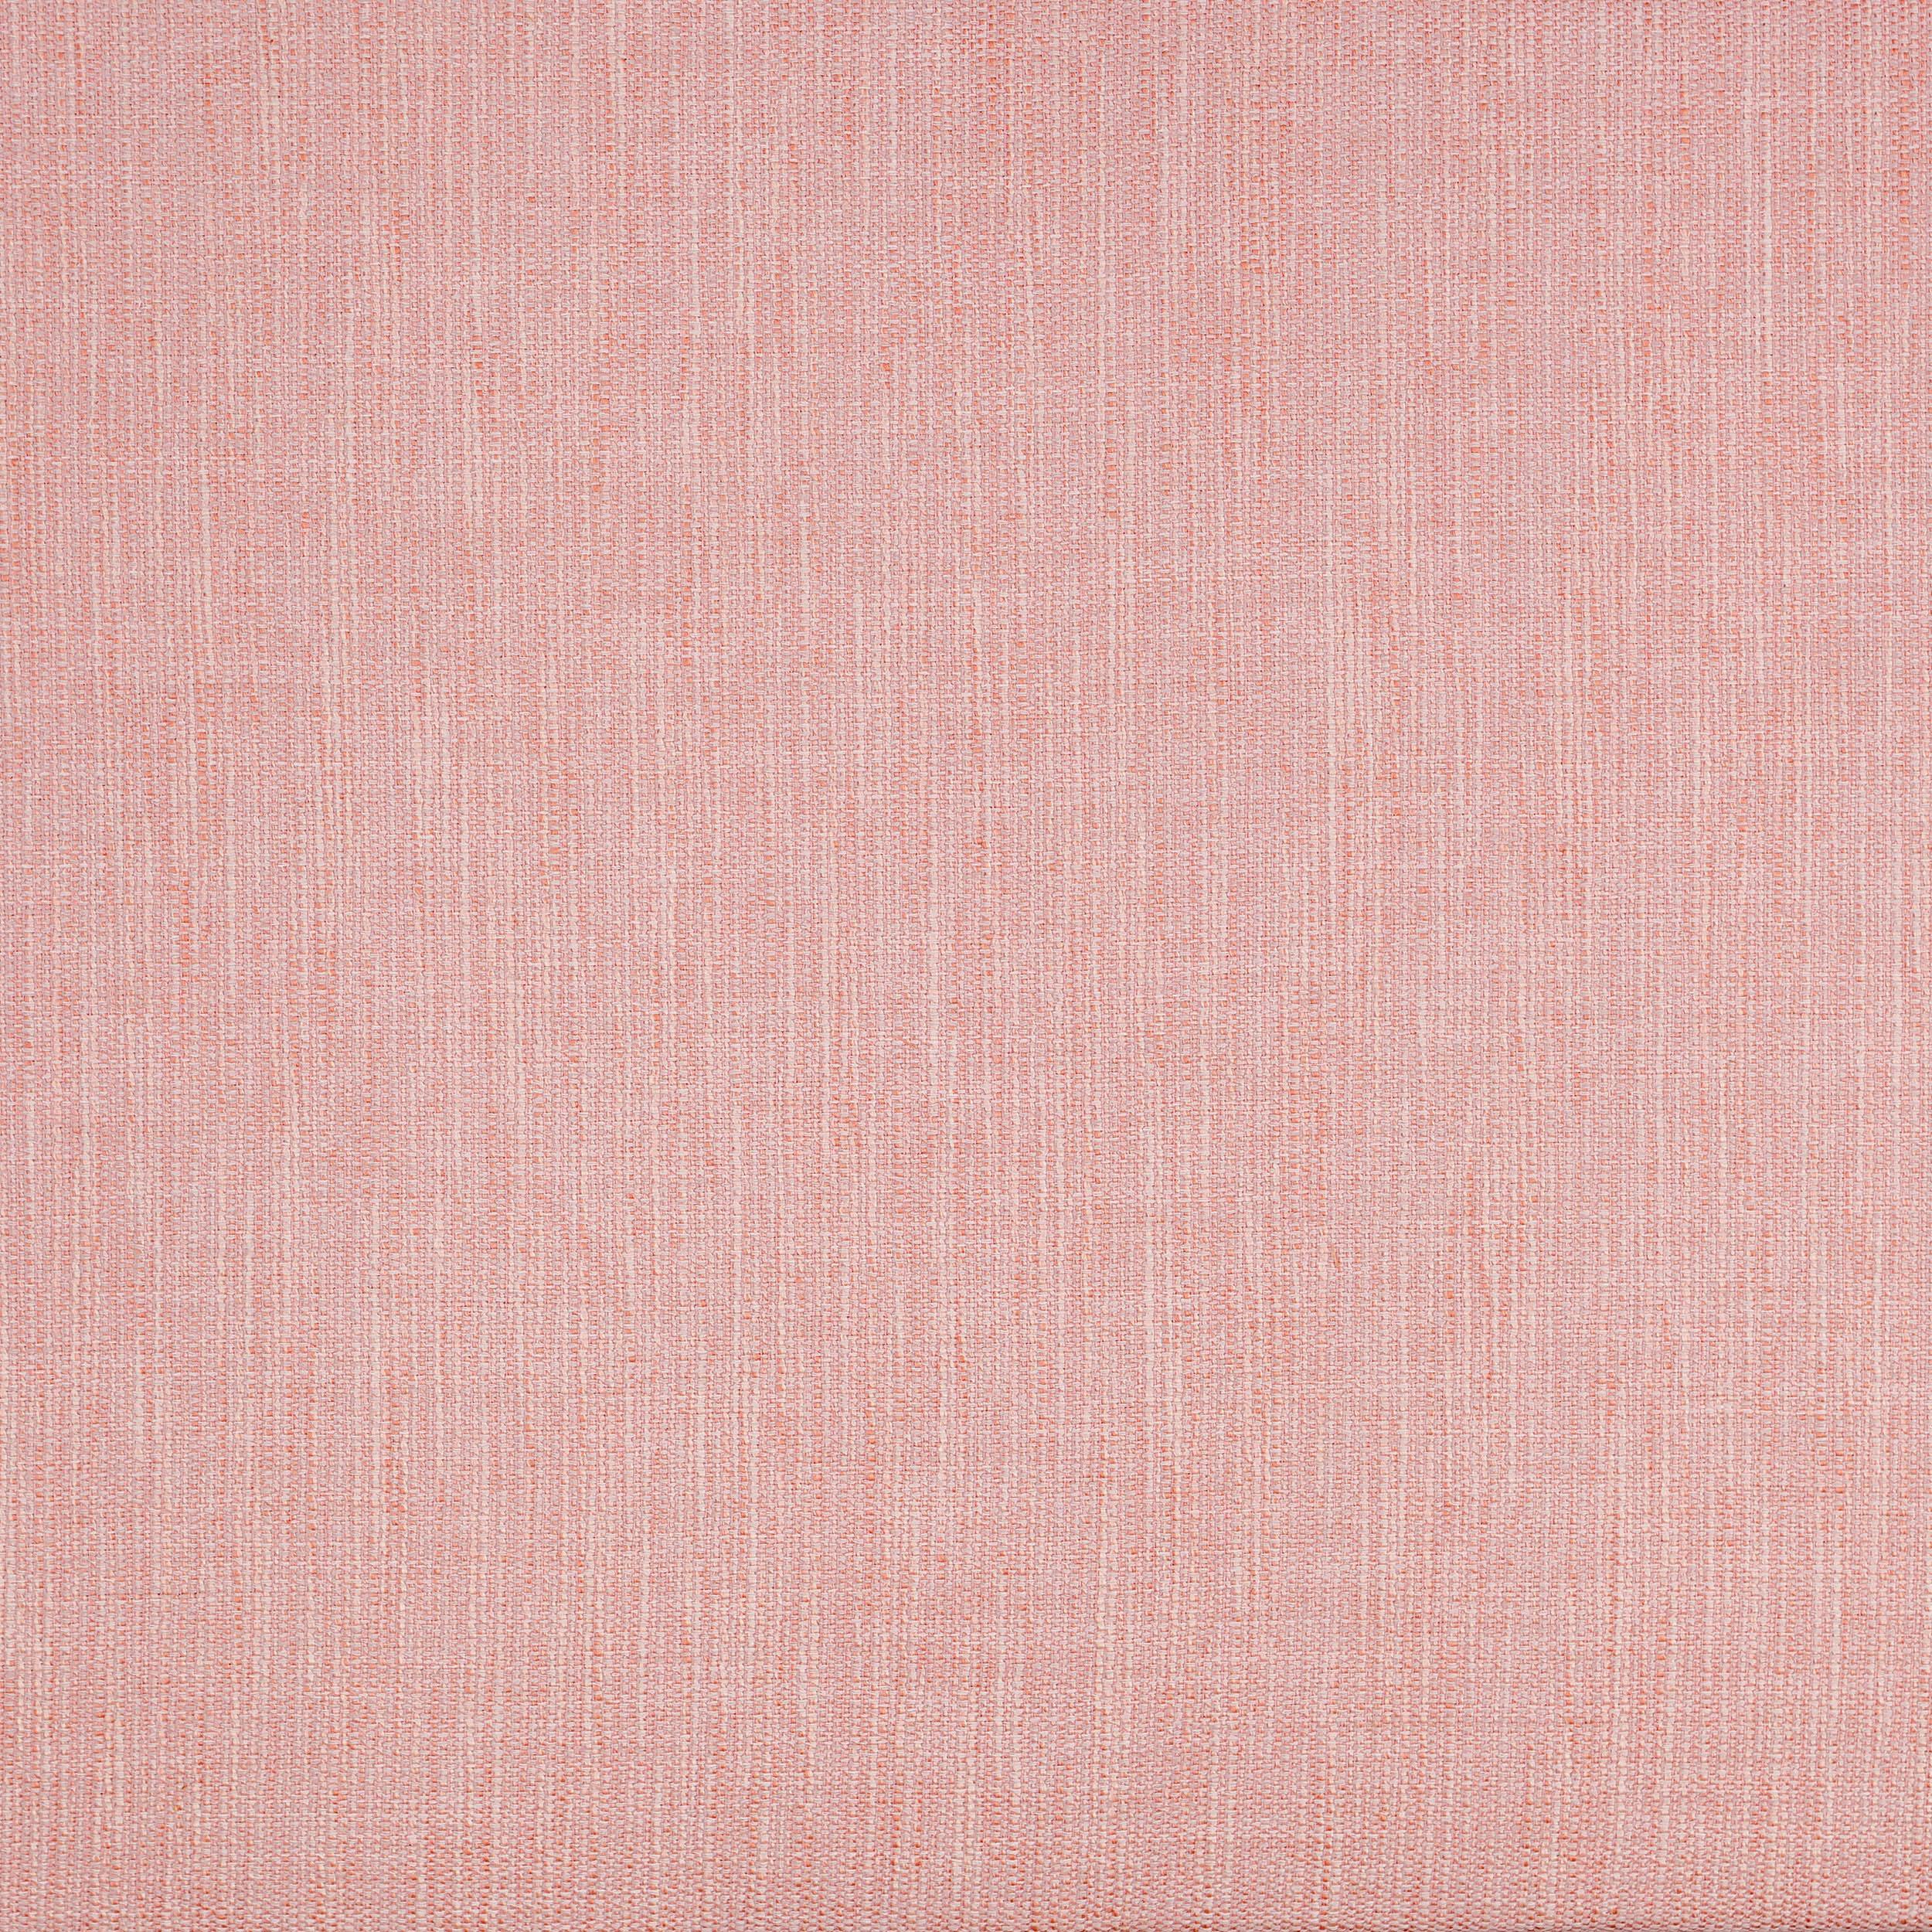 Bari Pink